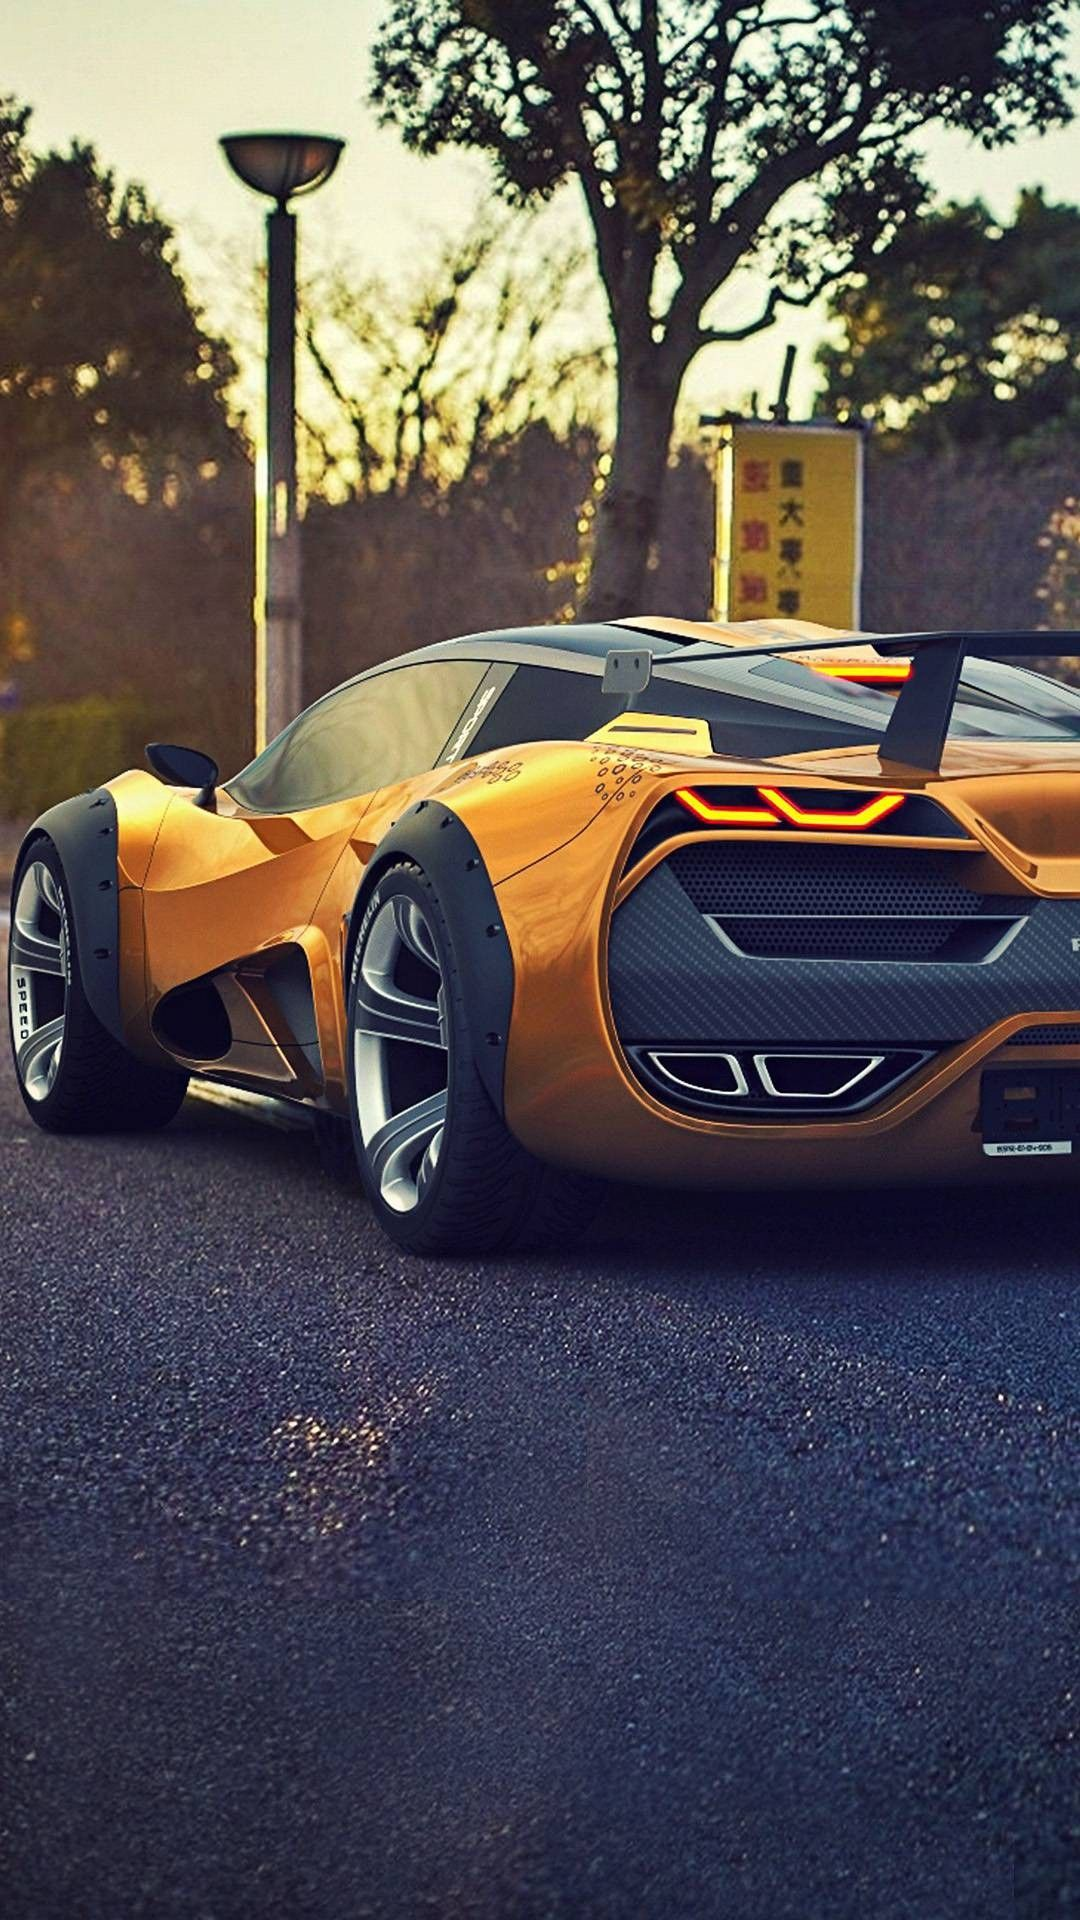 Muchatseble Supercars Lamborghini Cars Super Cars Car Wallpapers